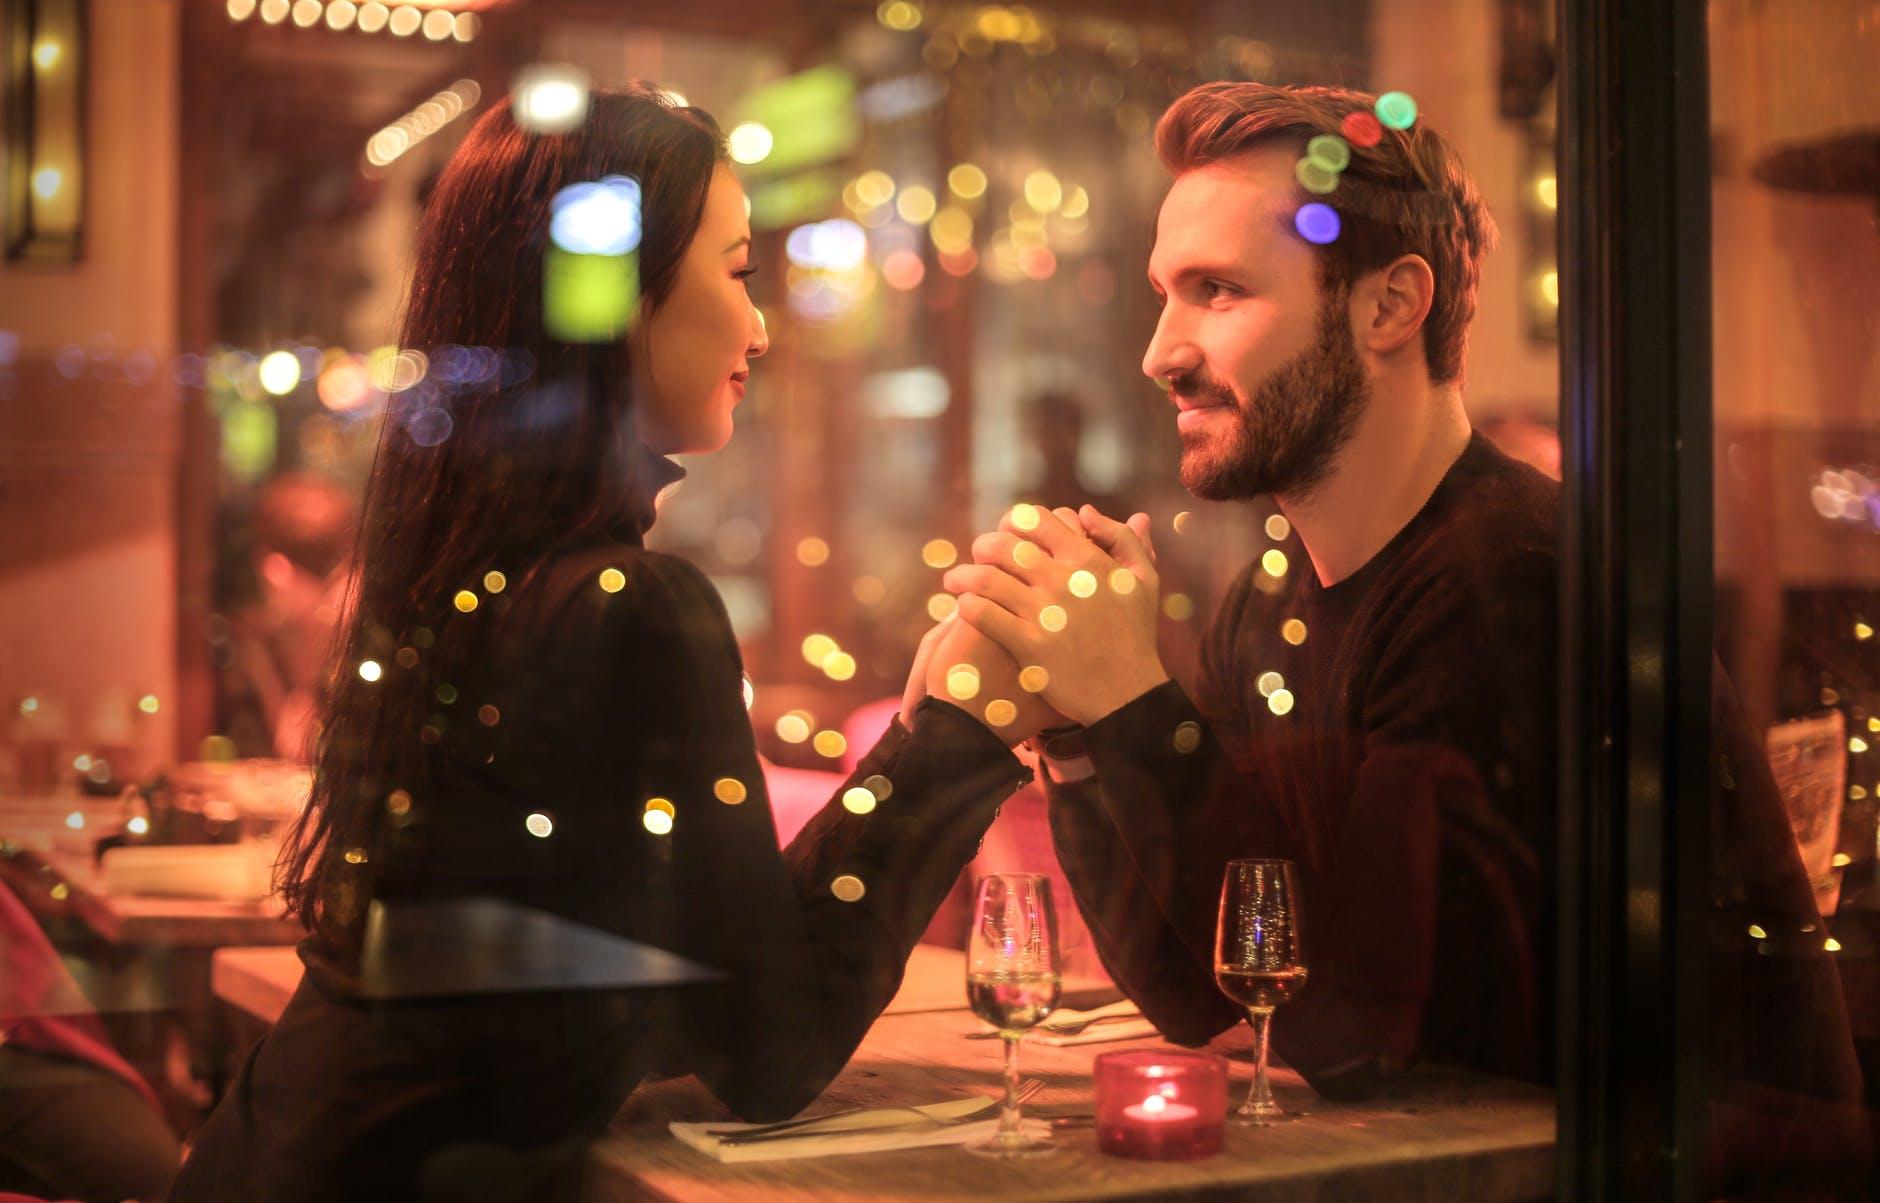 Hebikietsgemist overspel dating